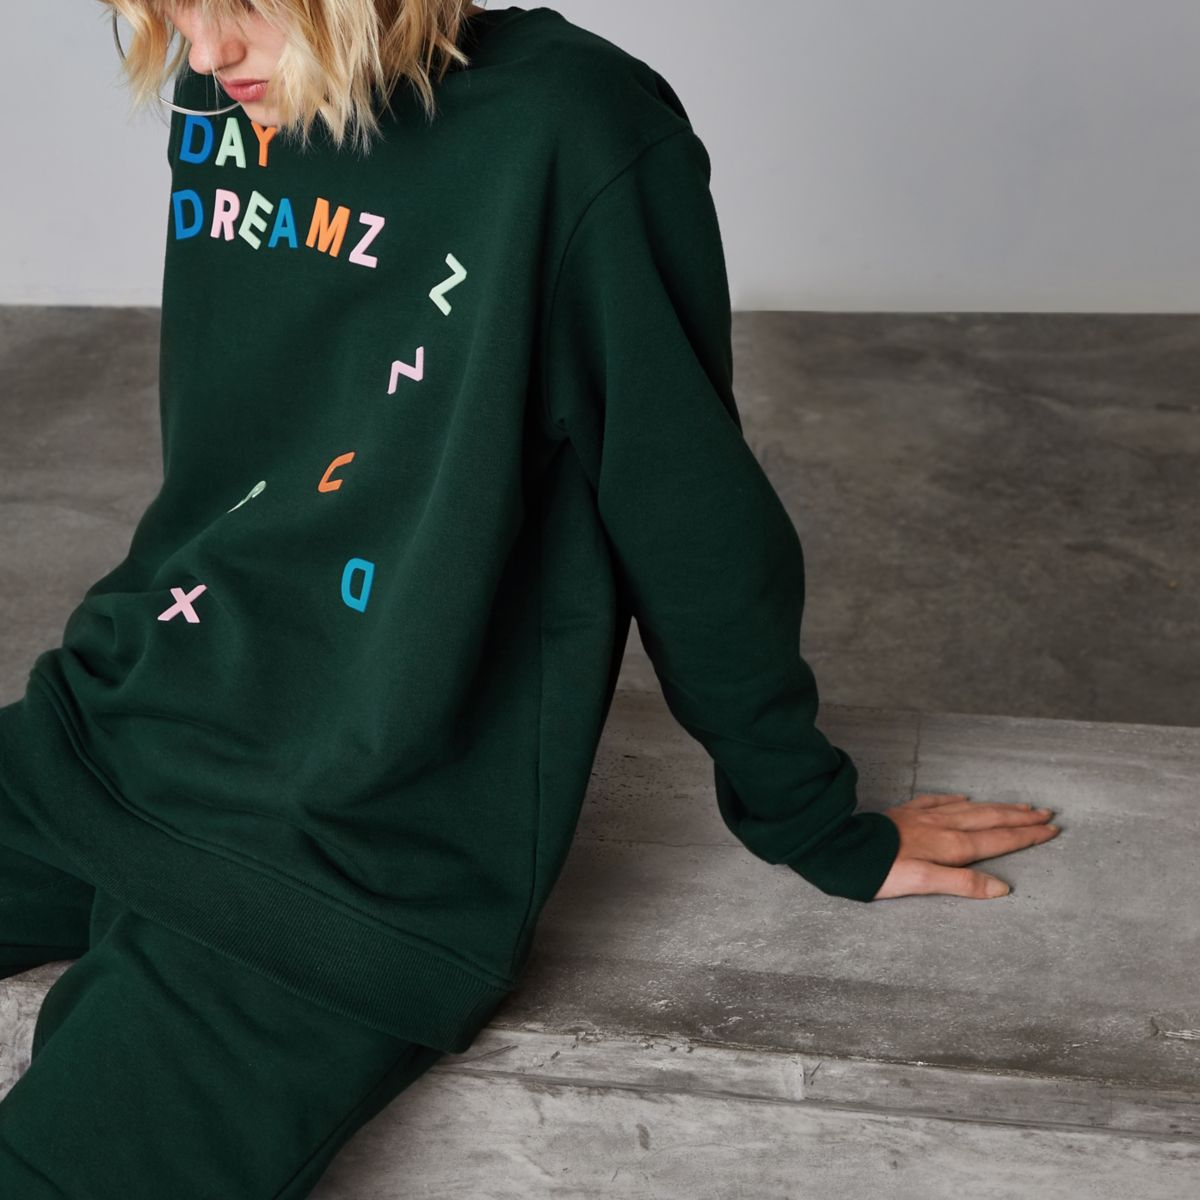 Green Ashish 'day dreamz' sweatshirt